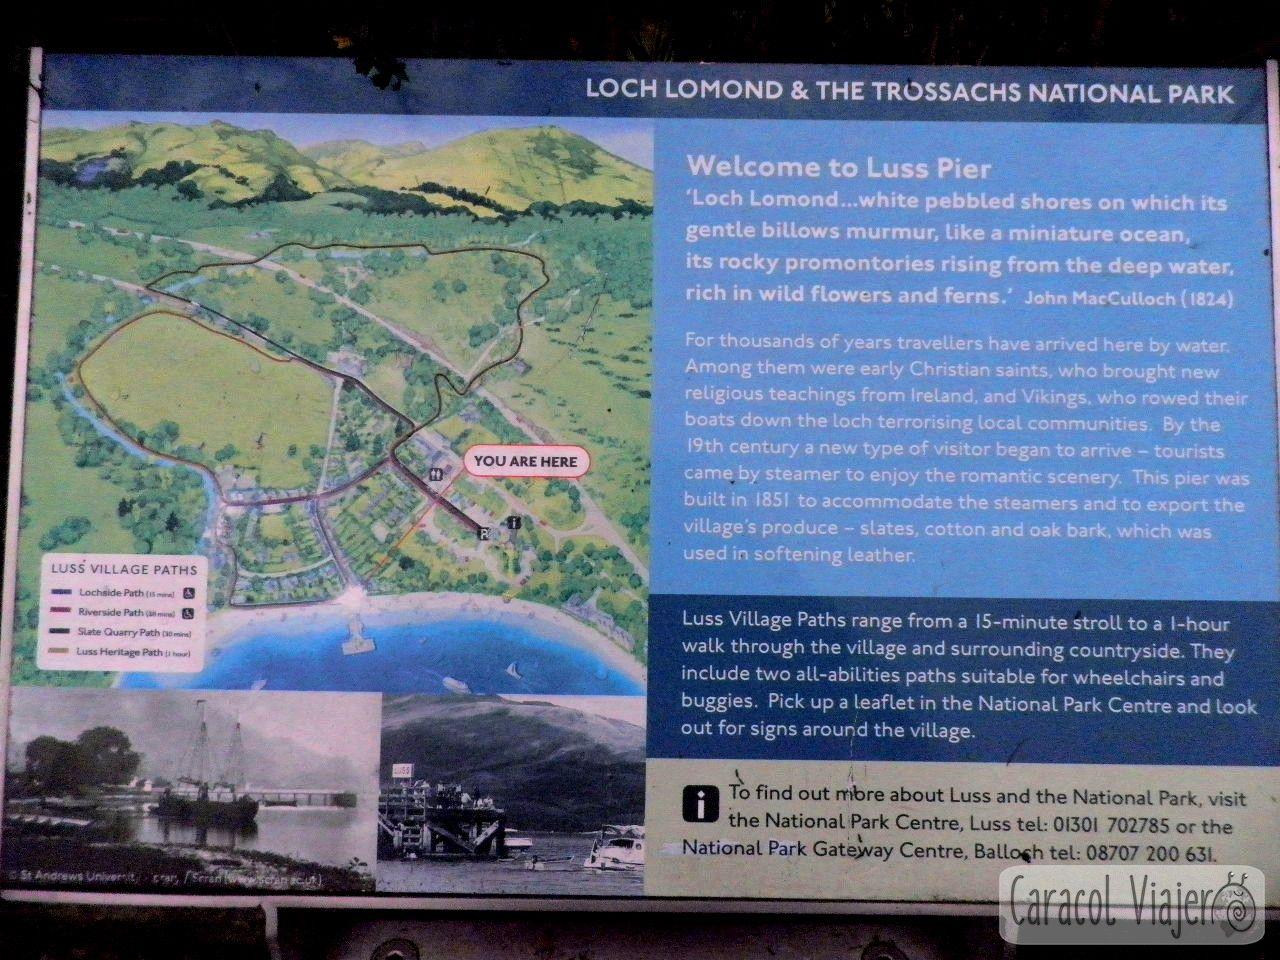 Mapa recorrido Tossachs N.P.